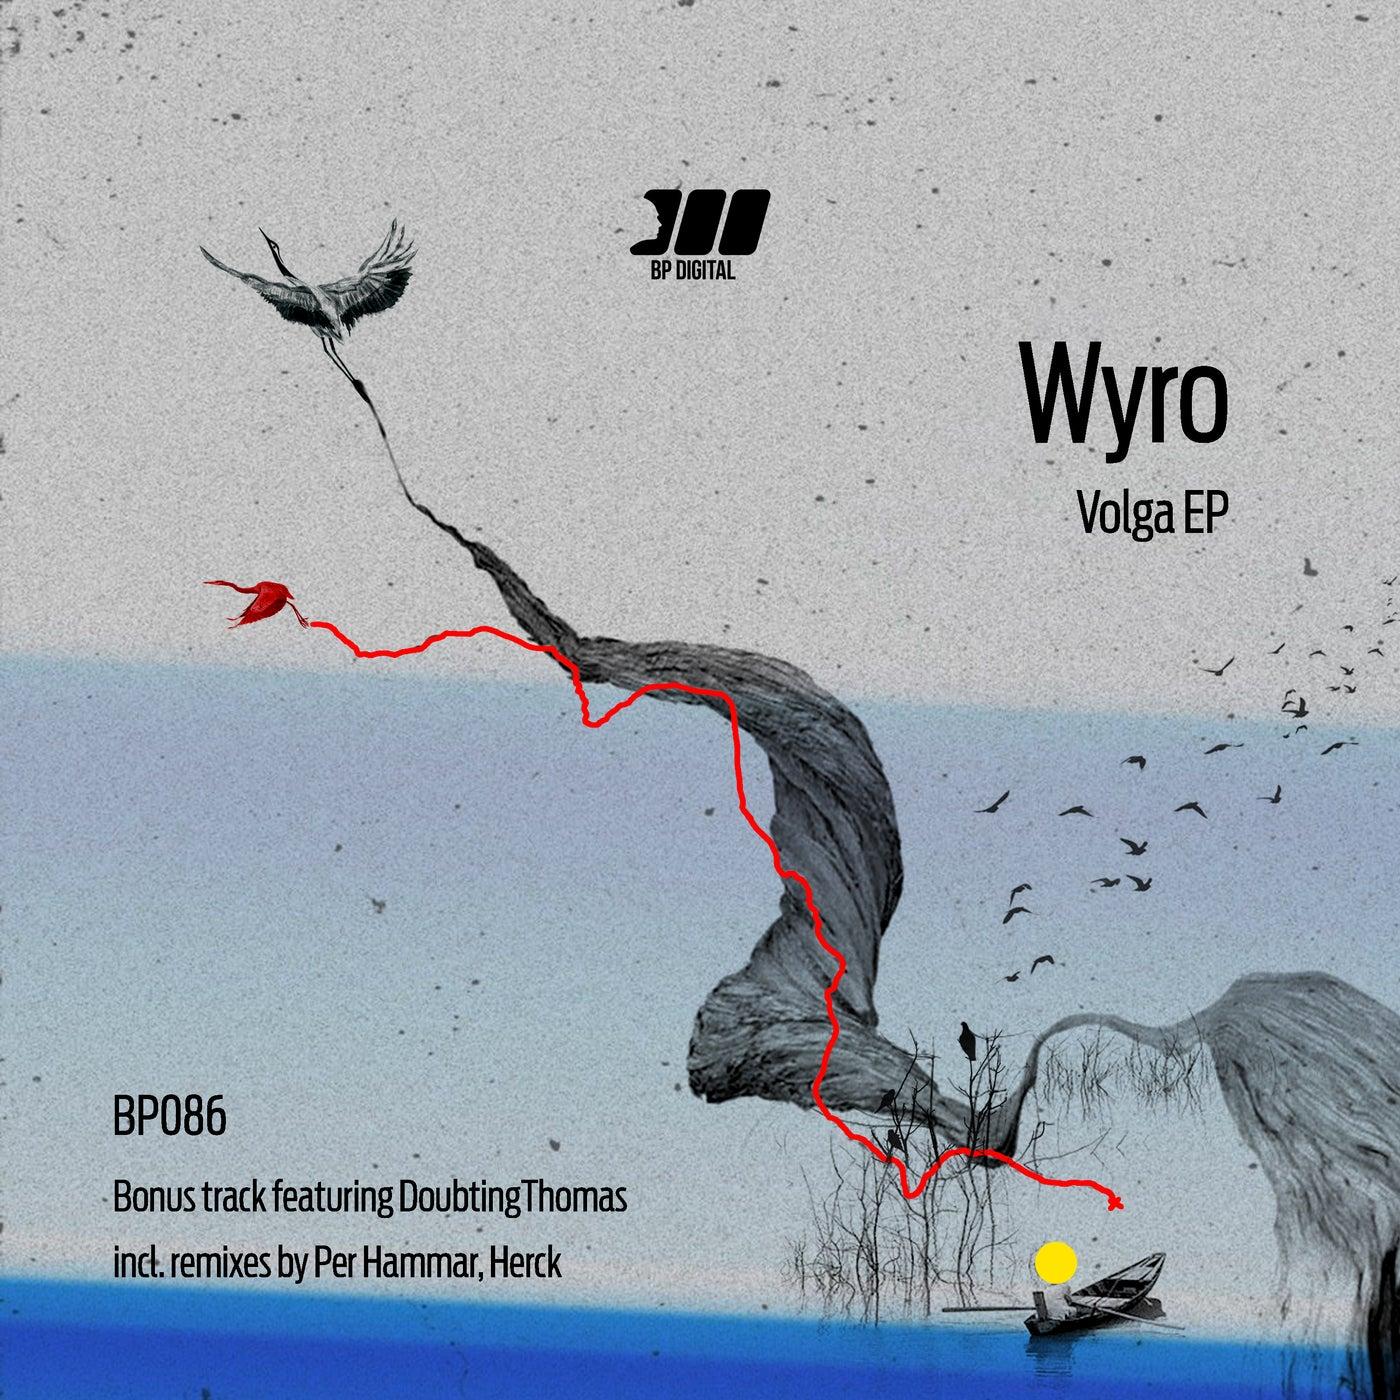 Wyro - Volga EP (incl. Katsuba, Doubtingthomas, Per Hammar, Herck) [BPrecs]